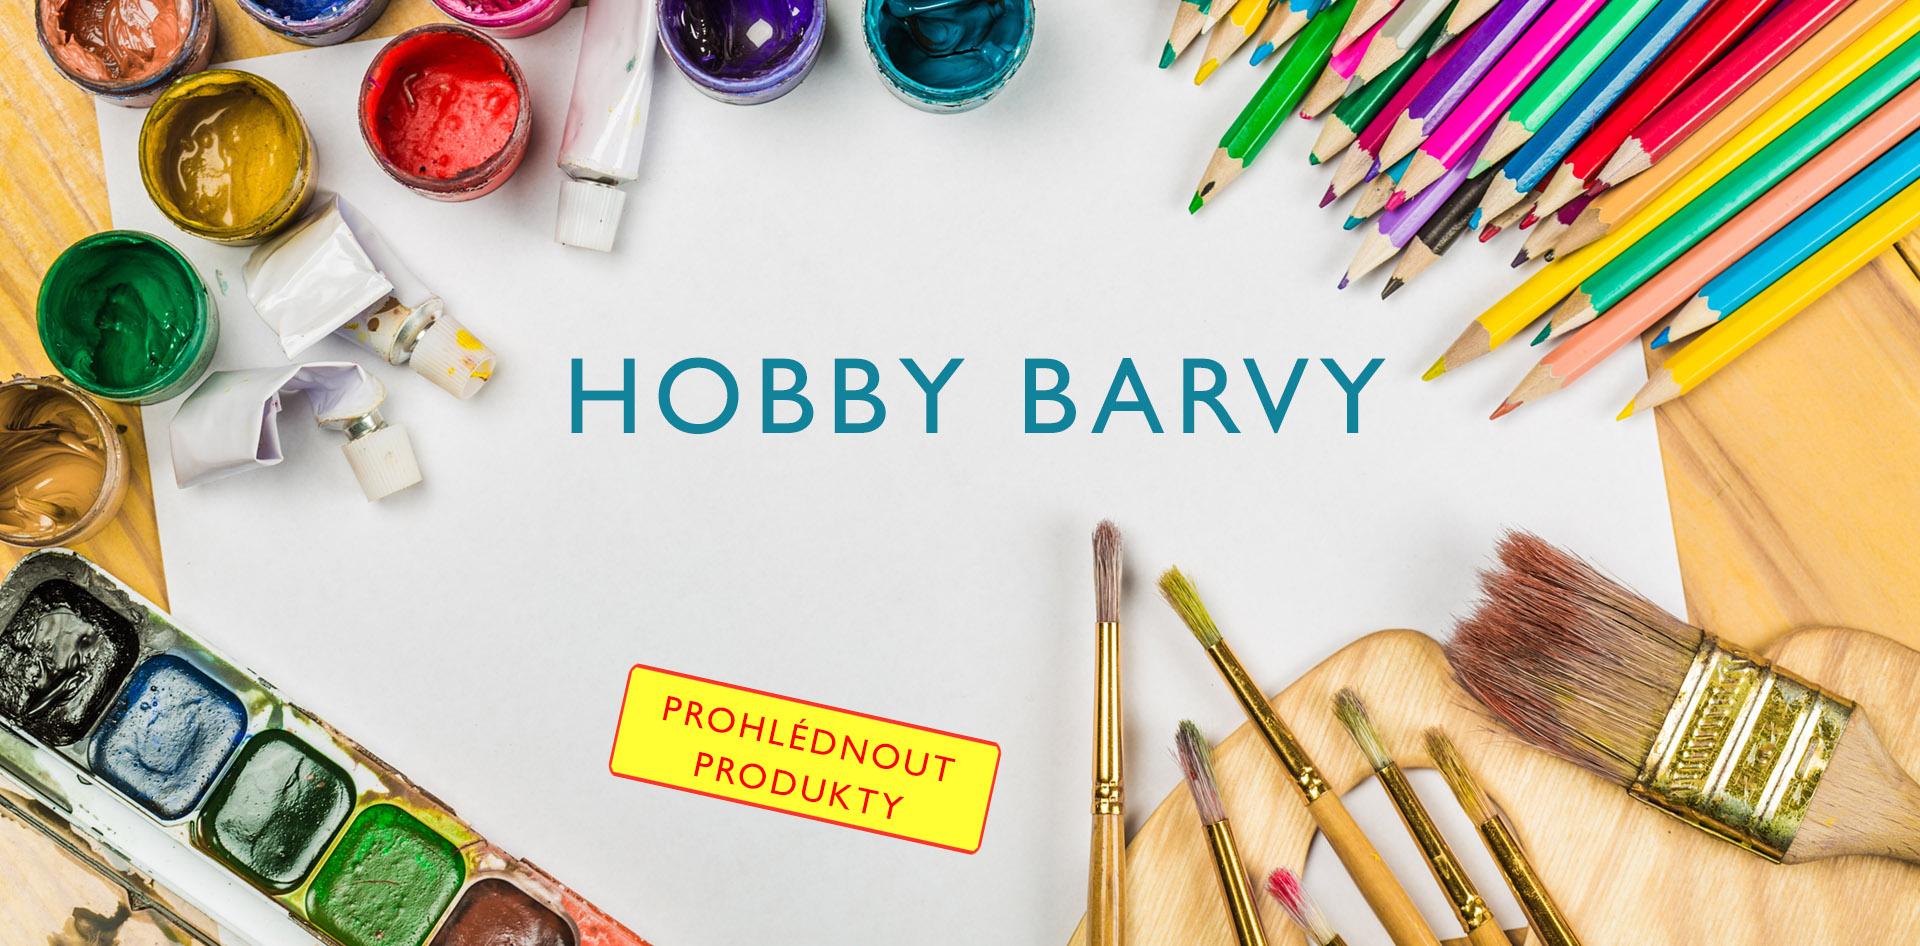 Hobby barvy